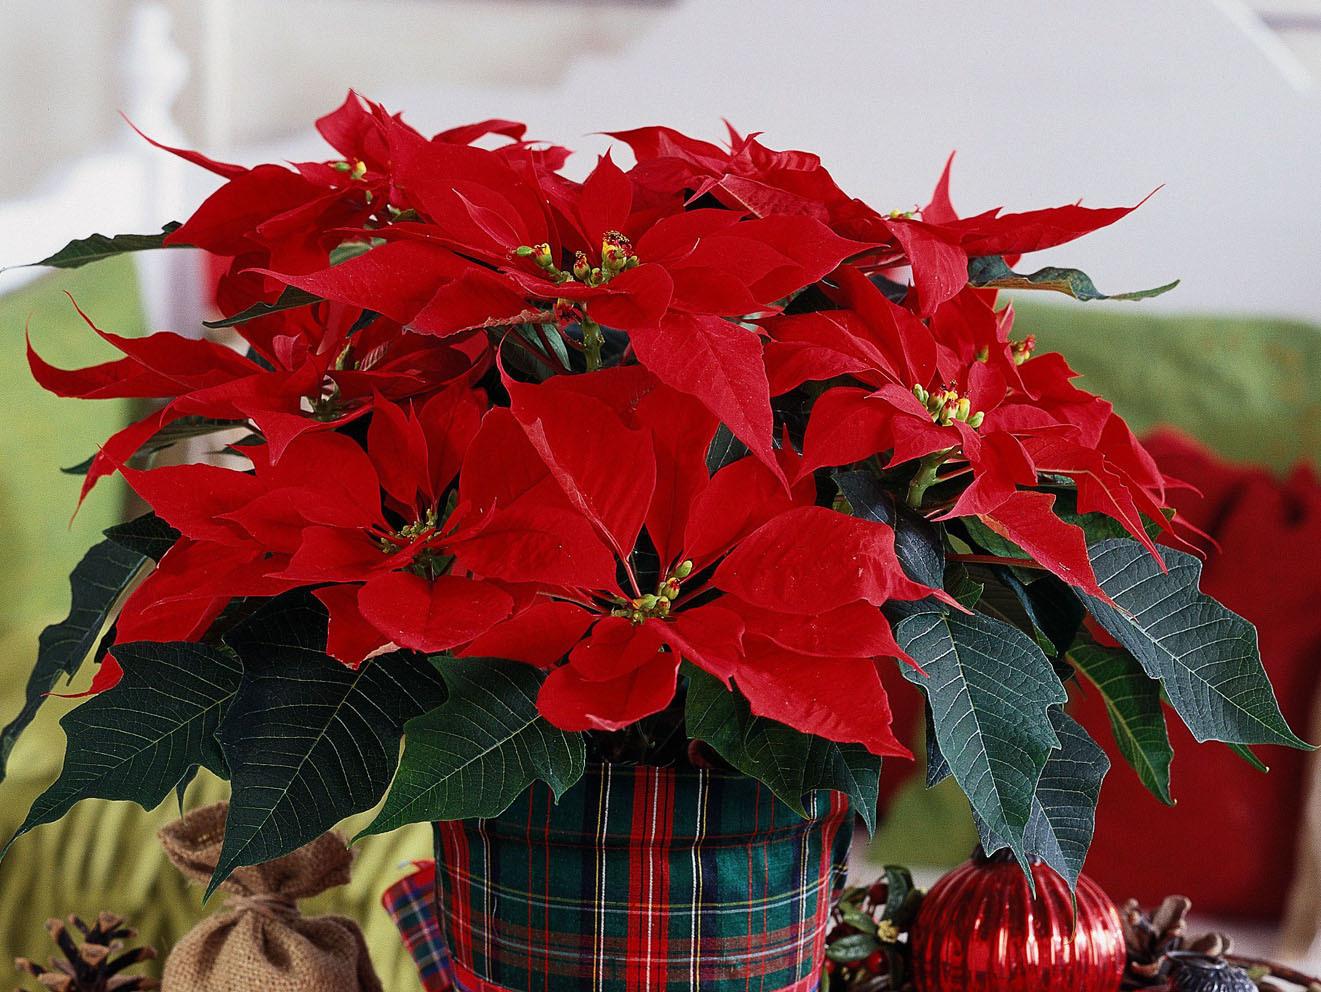 Цветок рождественская звезда размножение в домашних условиях фото